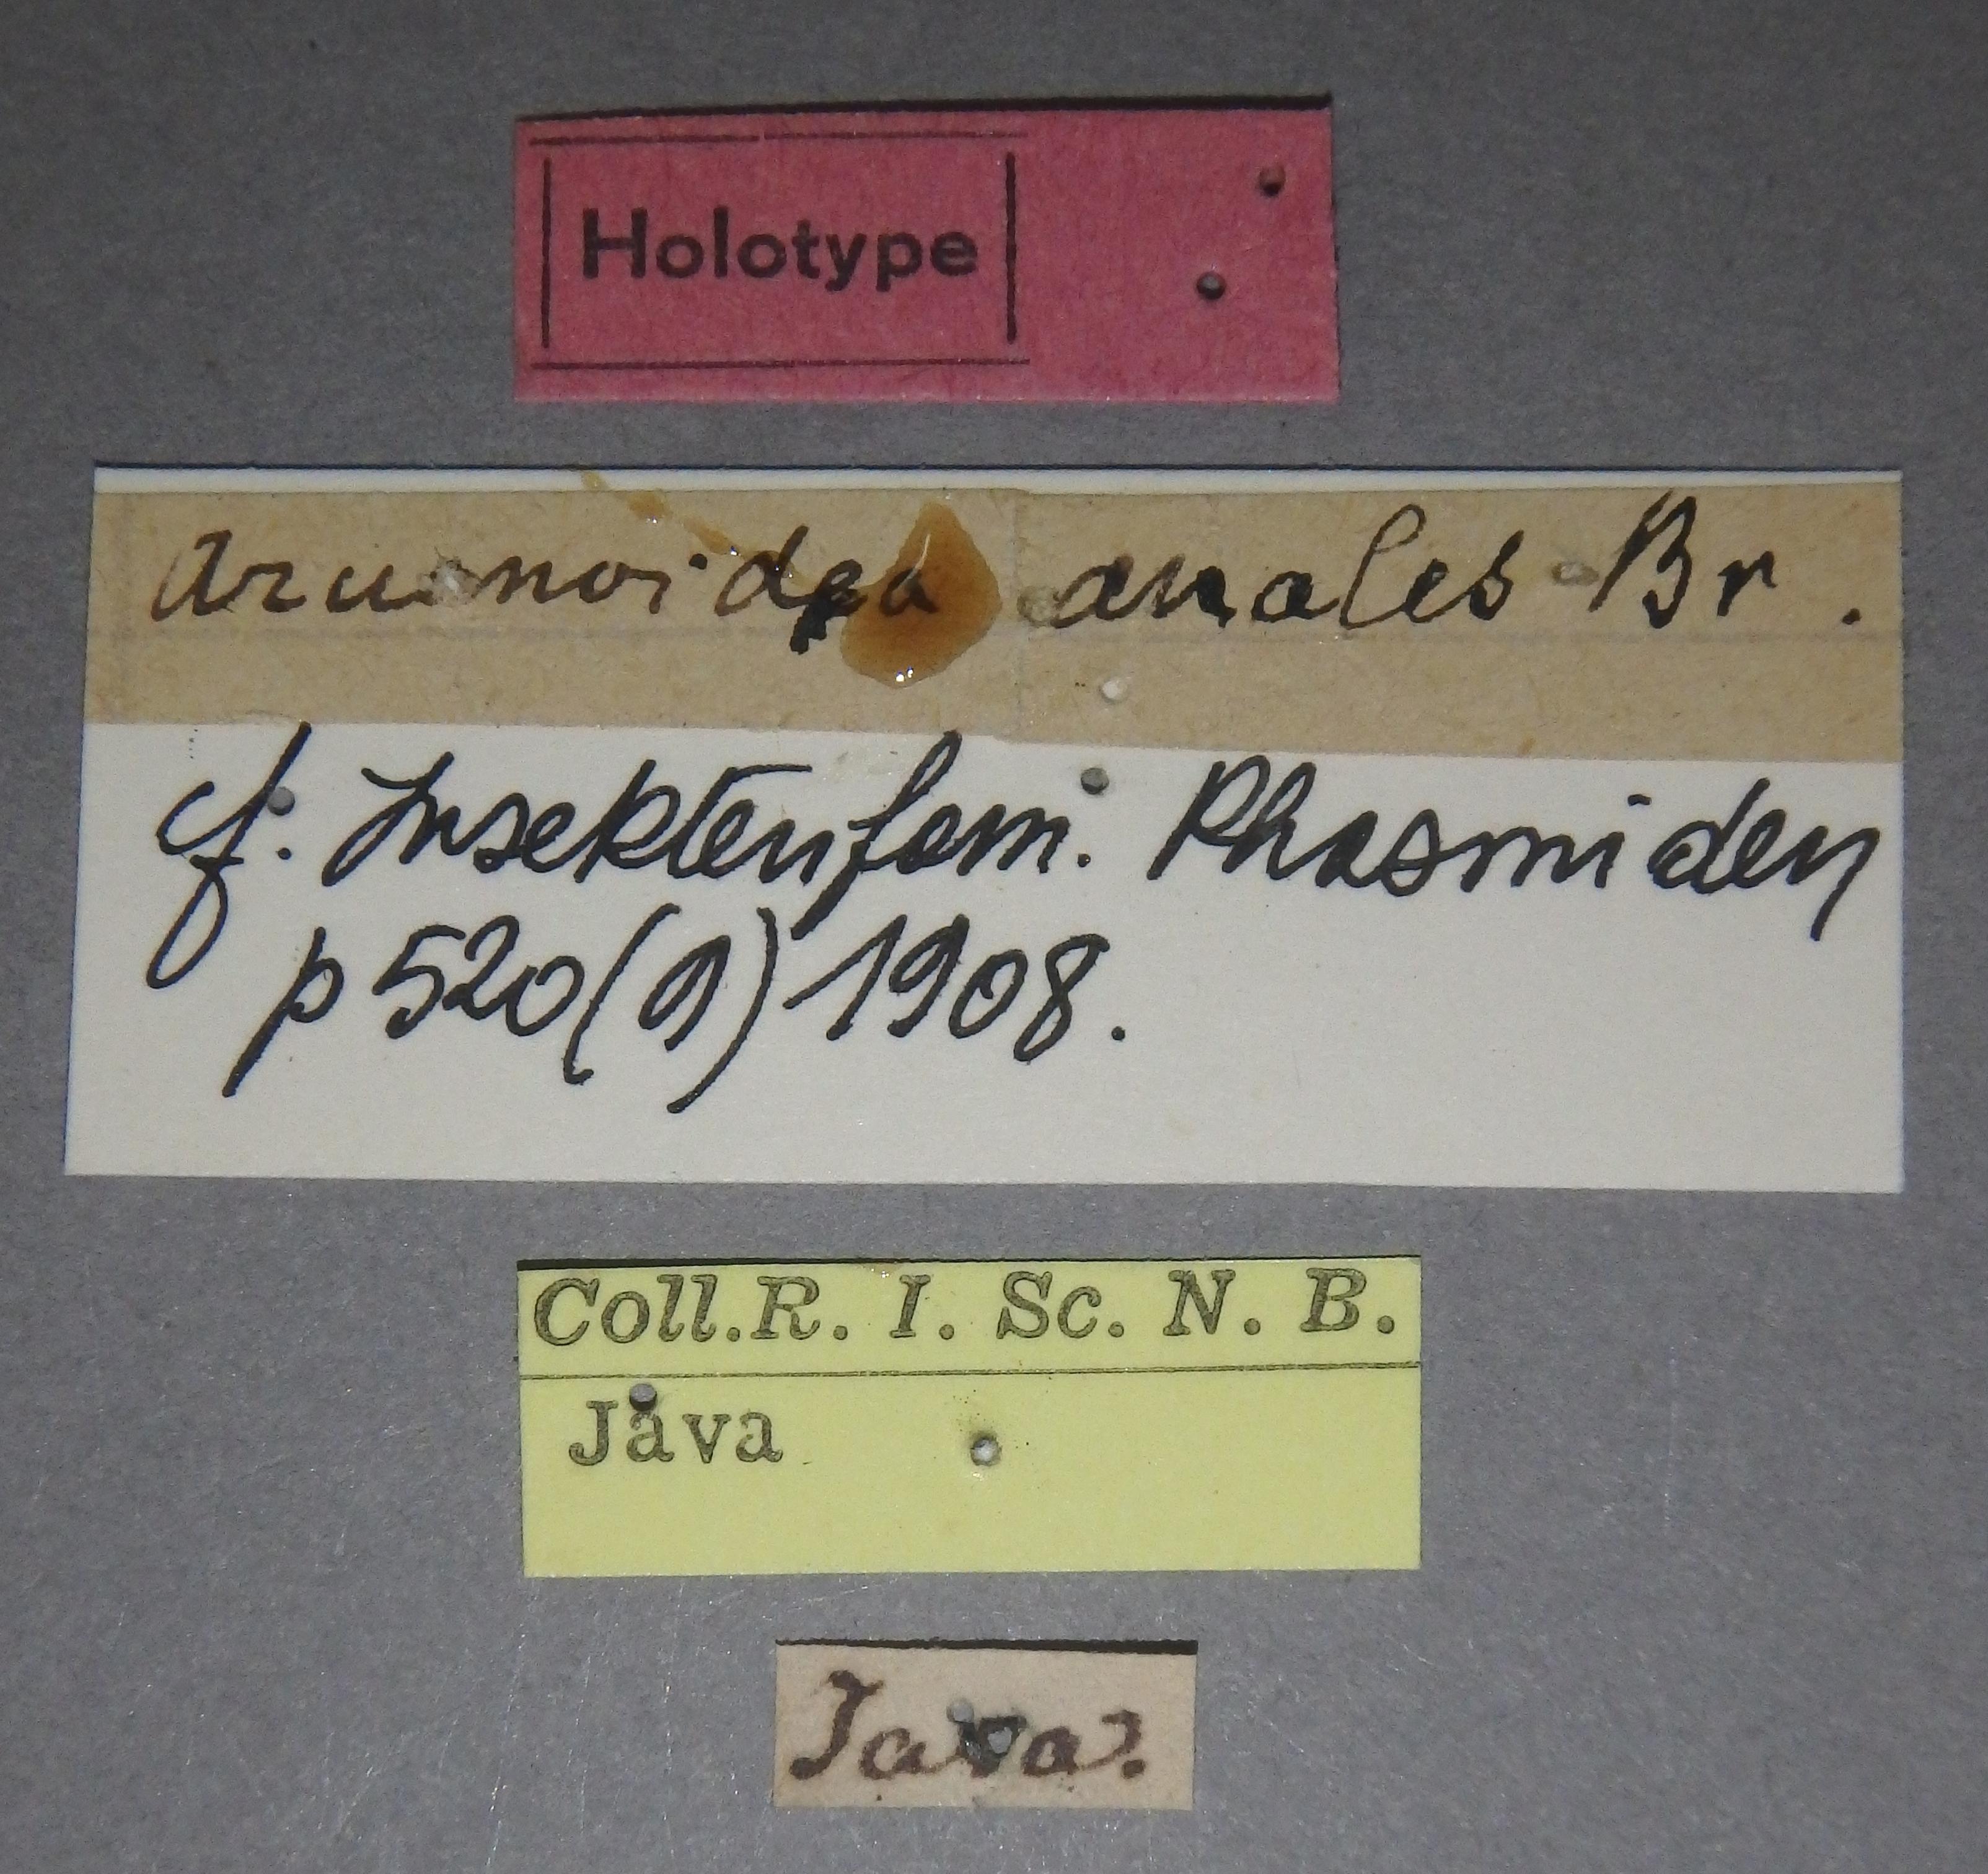 Aruanoidea analis ht Lb.JPG